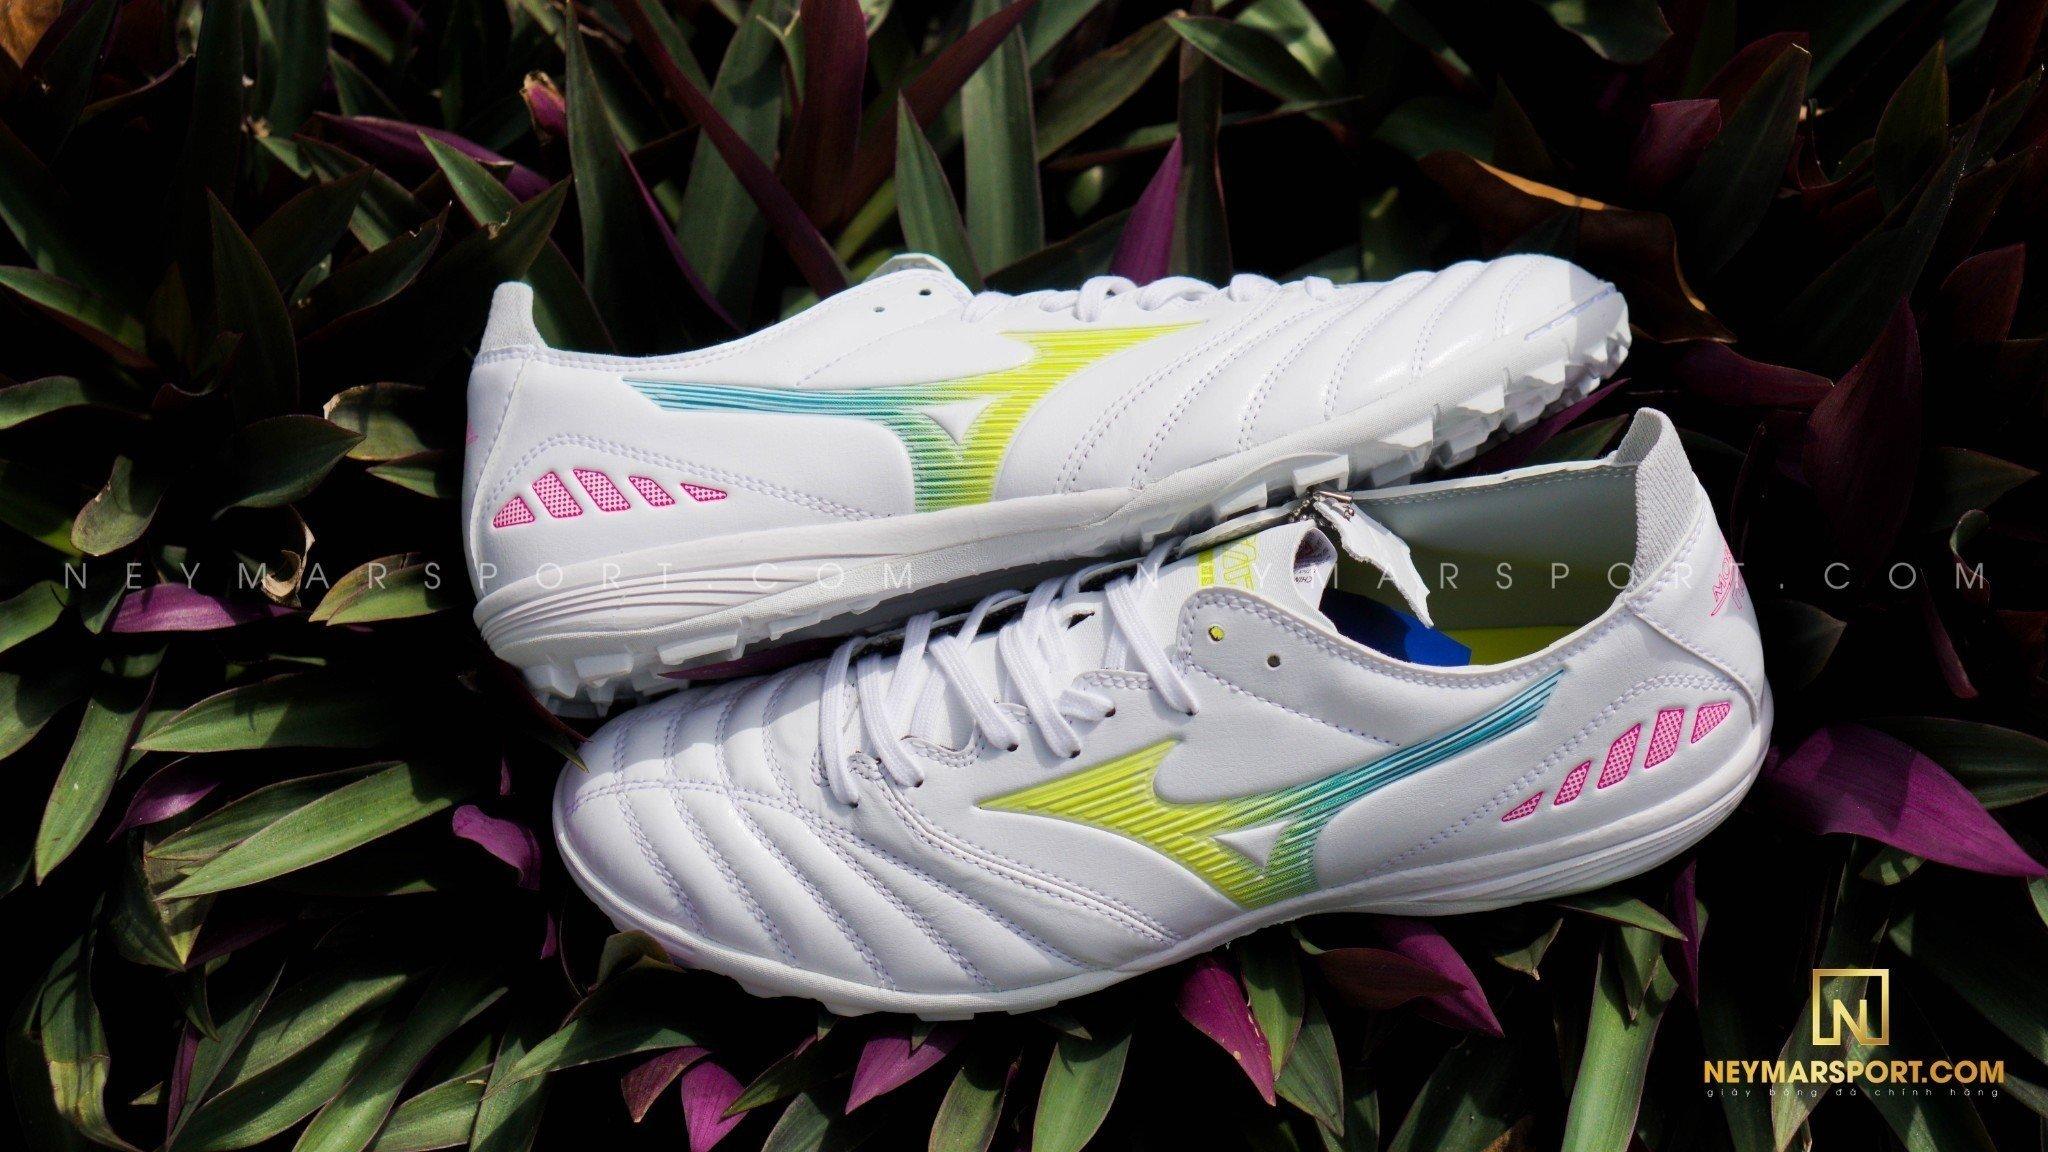 Giày cỏ nhân tạo Mizuno Morelia Neo III Pro As TF